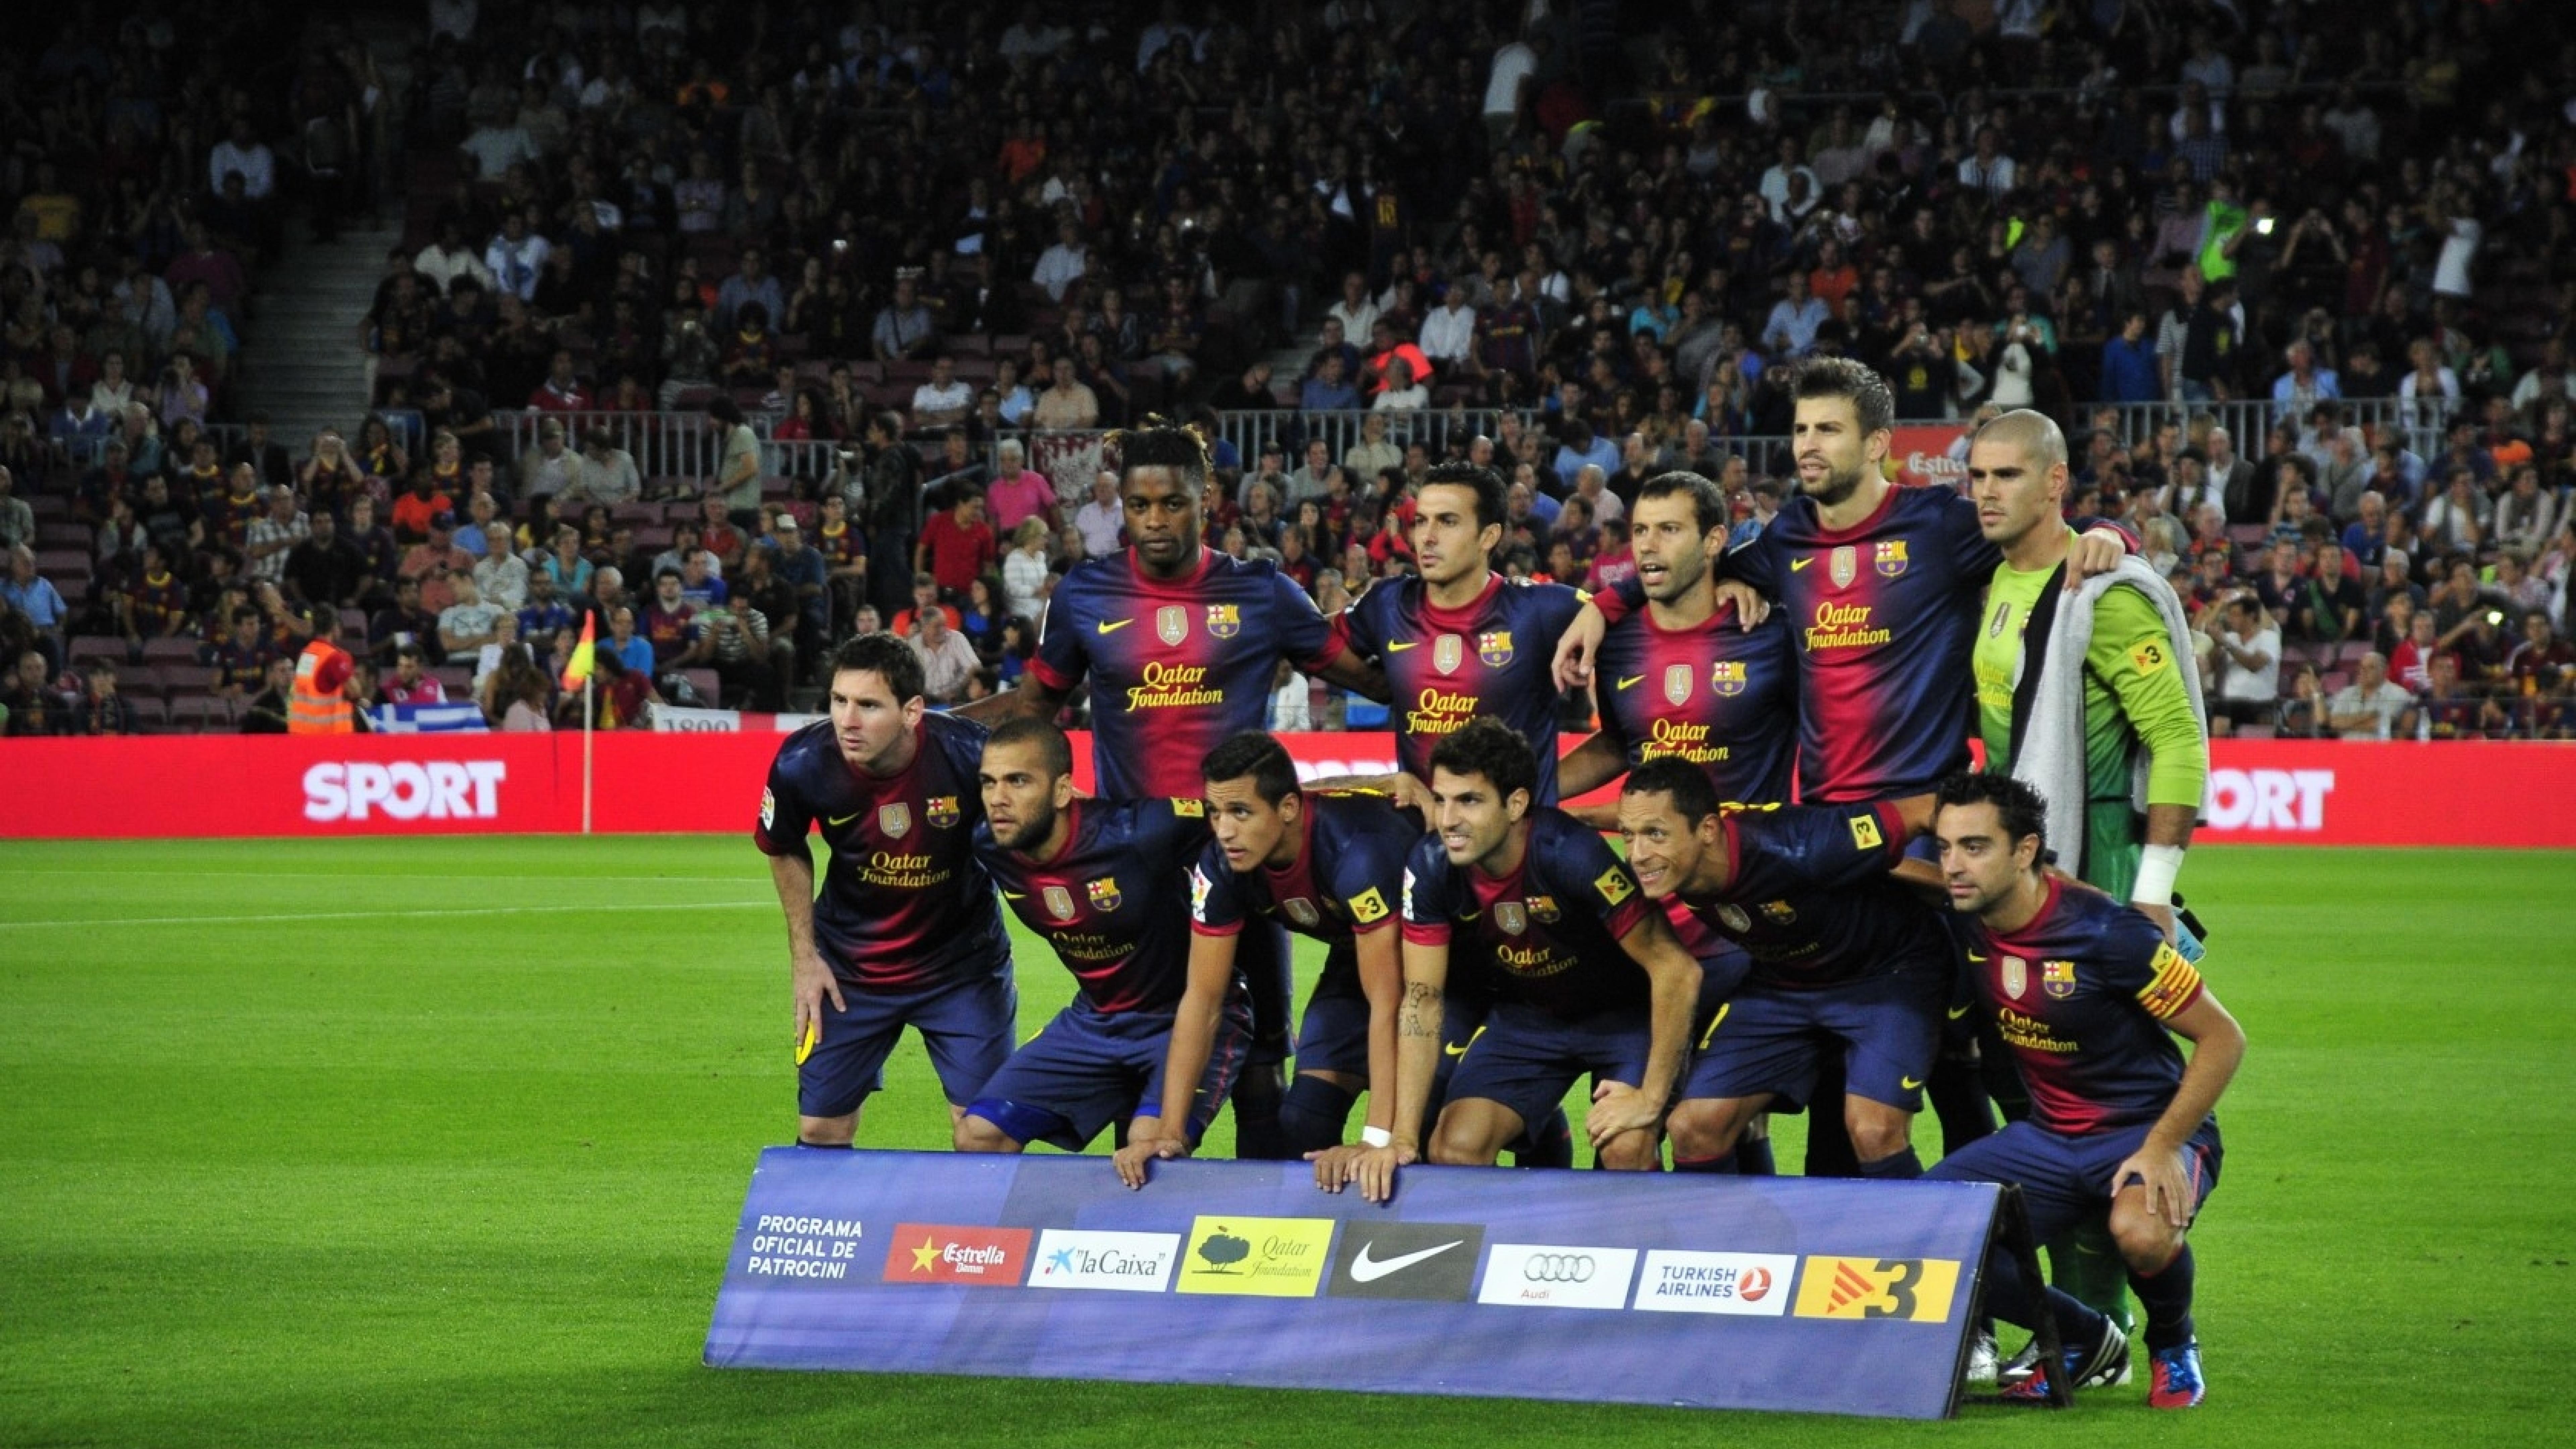 Barcelona composition camp nou full hd wallpaper - Camp nou barcelona wallpapers hd ...